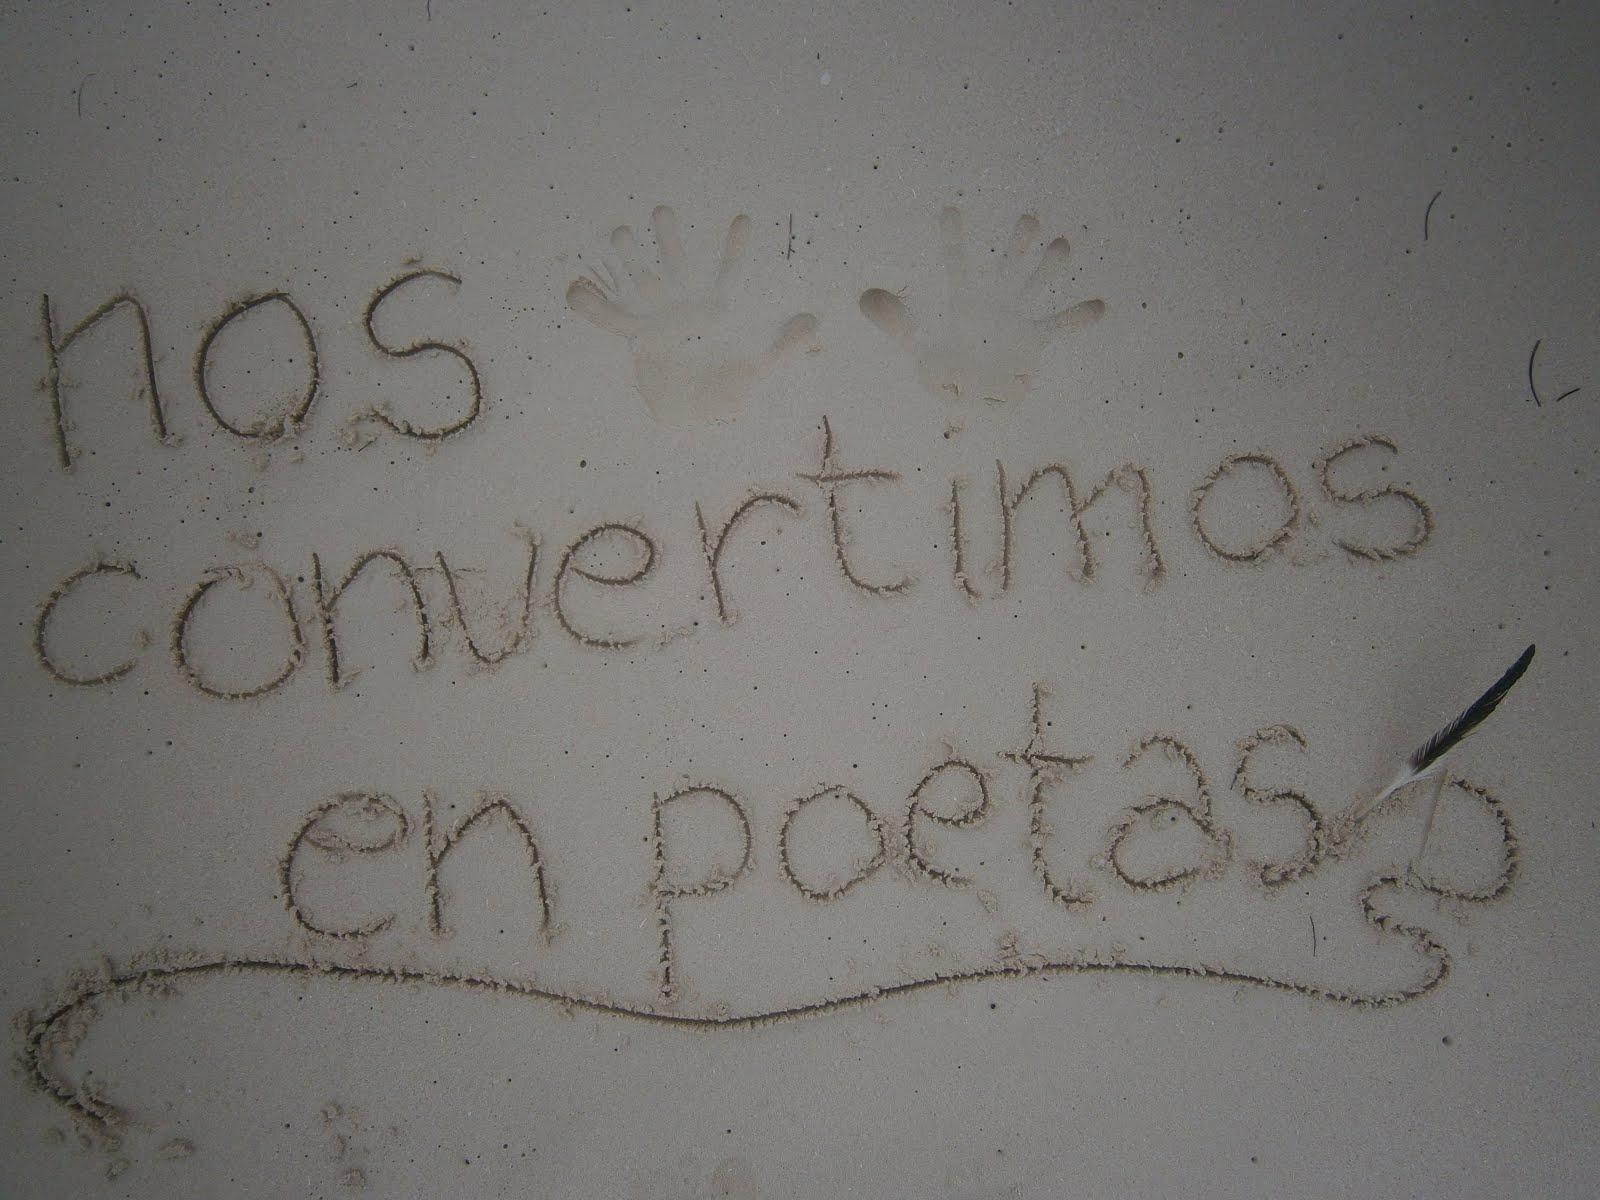 Nos convertimos en poetas